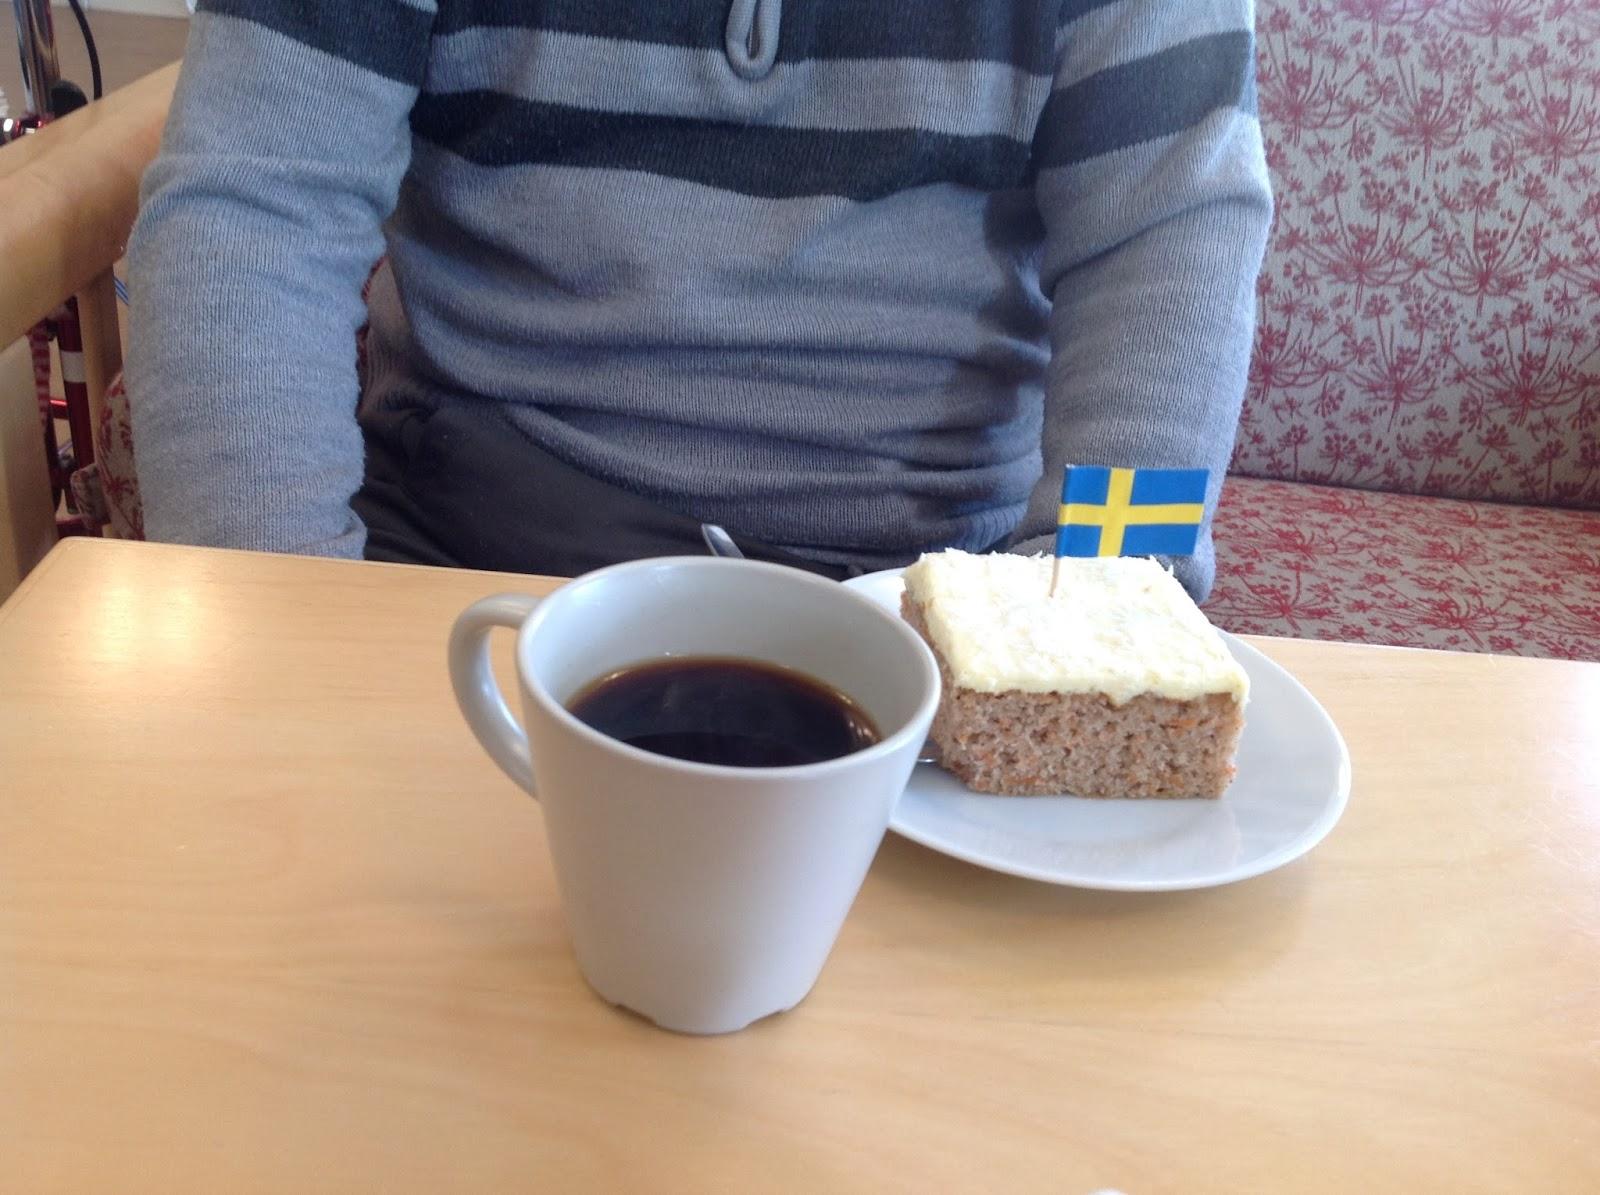 Algutsboda dating sweden - Agriturismo Pingitore